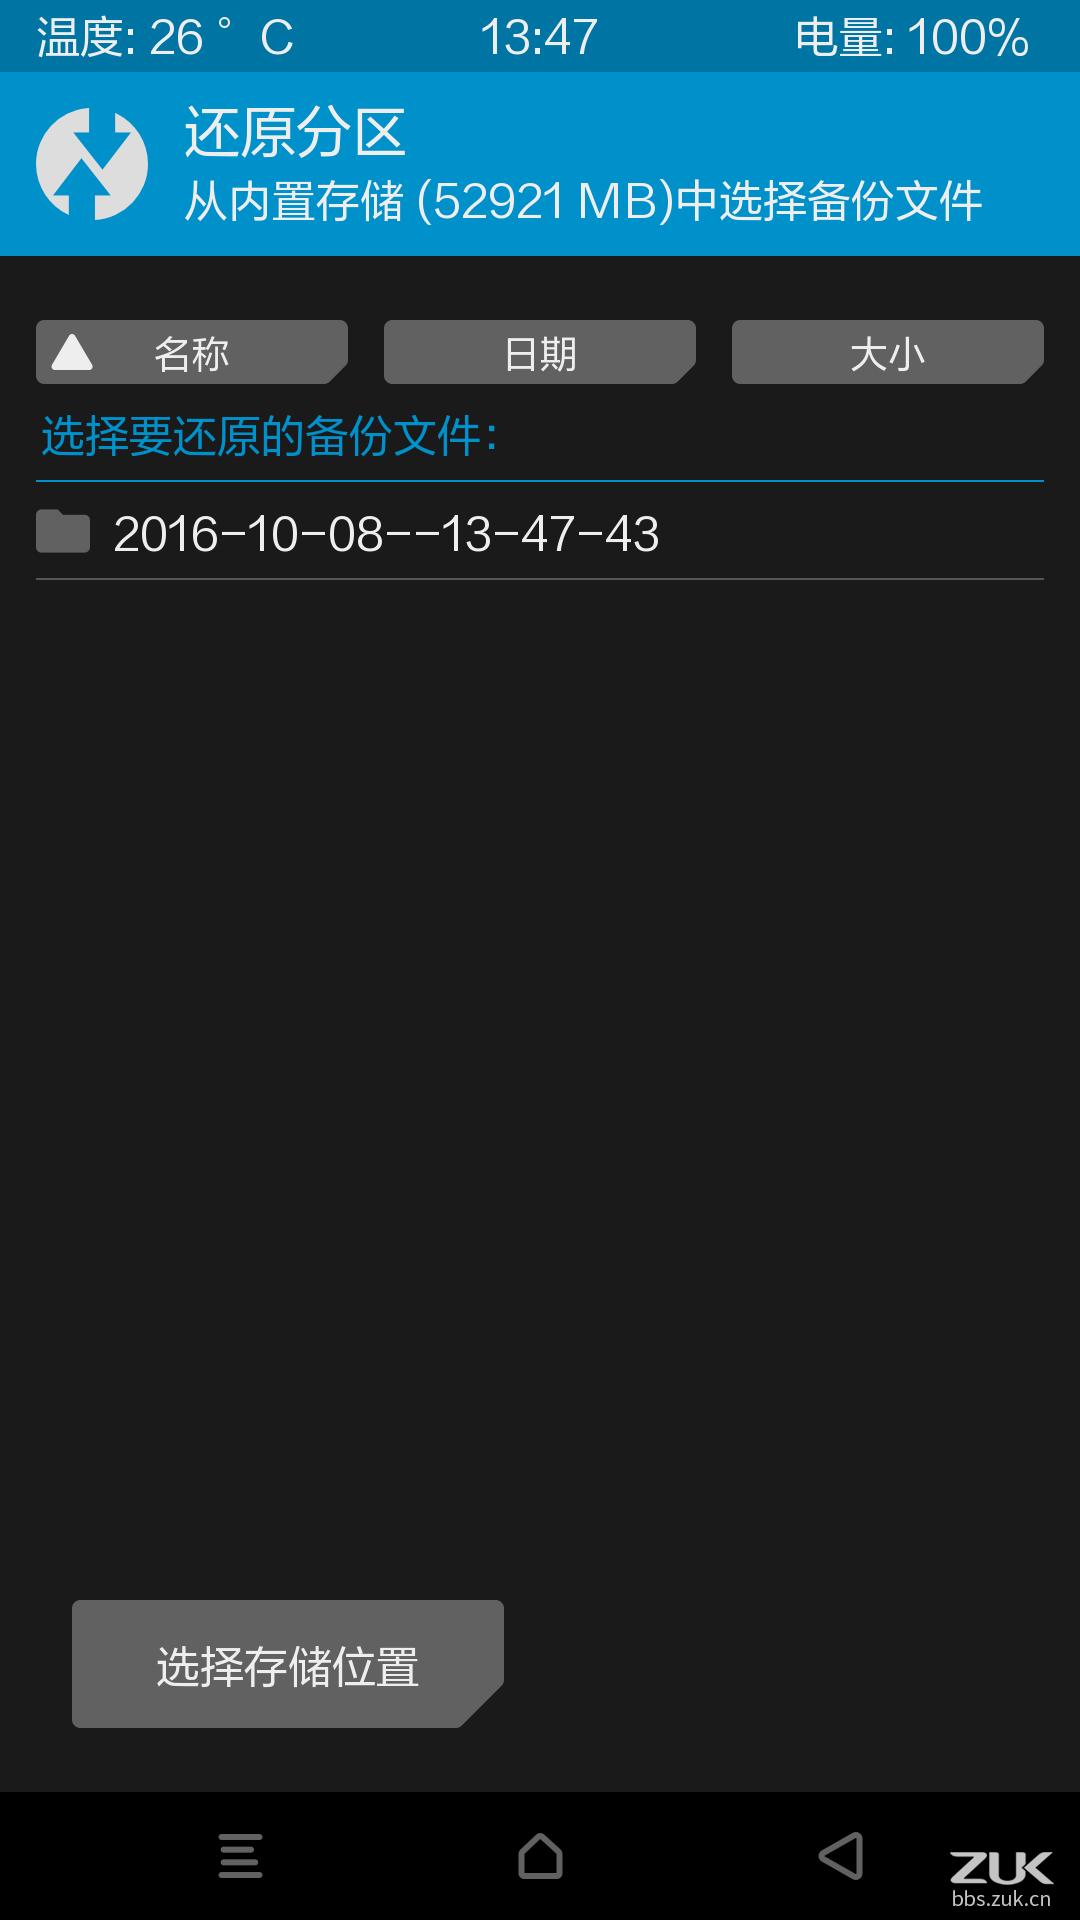 Screenshot_2016-10-08-13-47-54.png